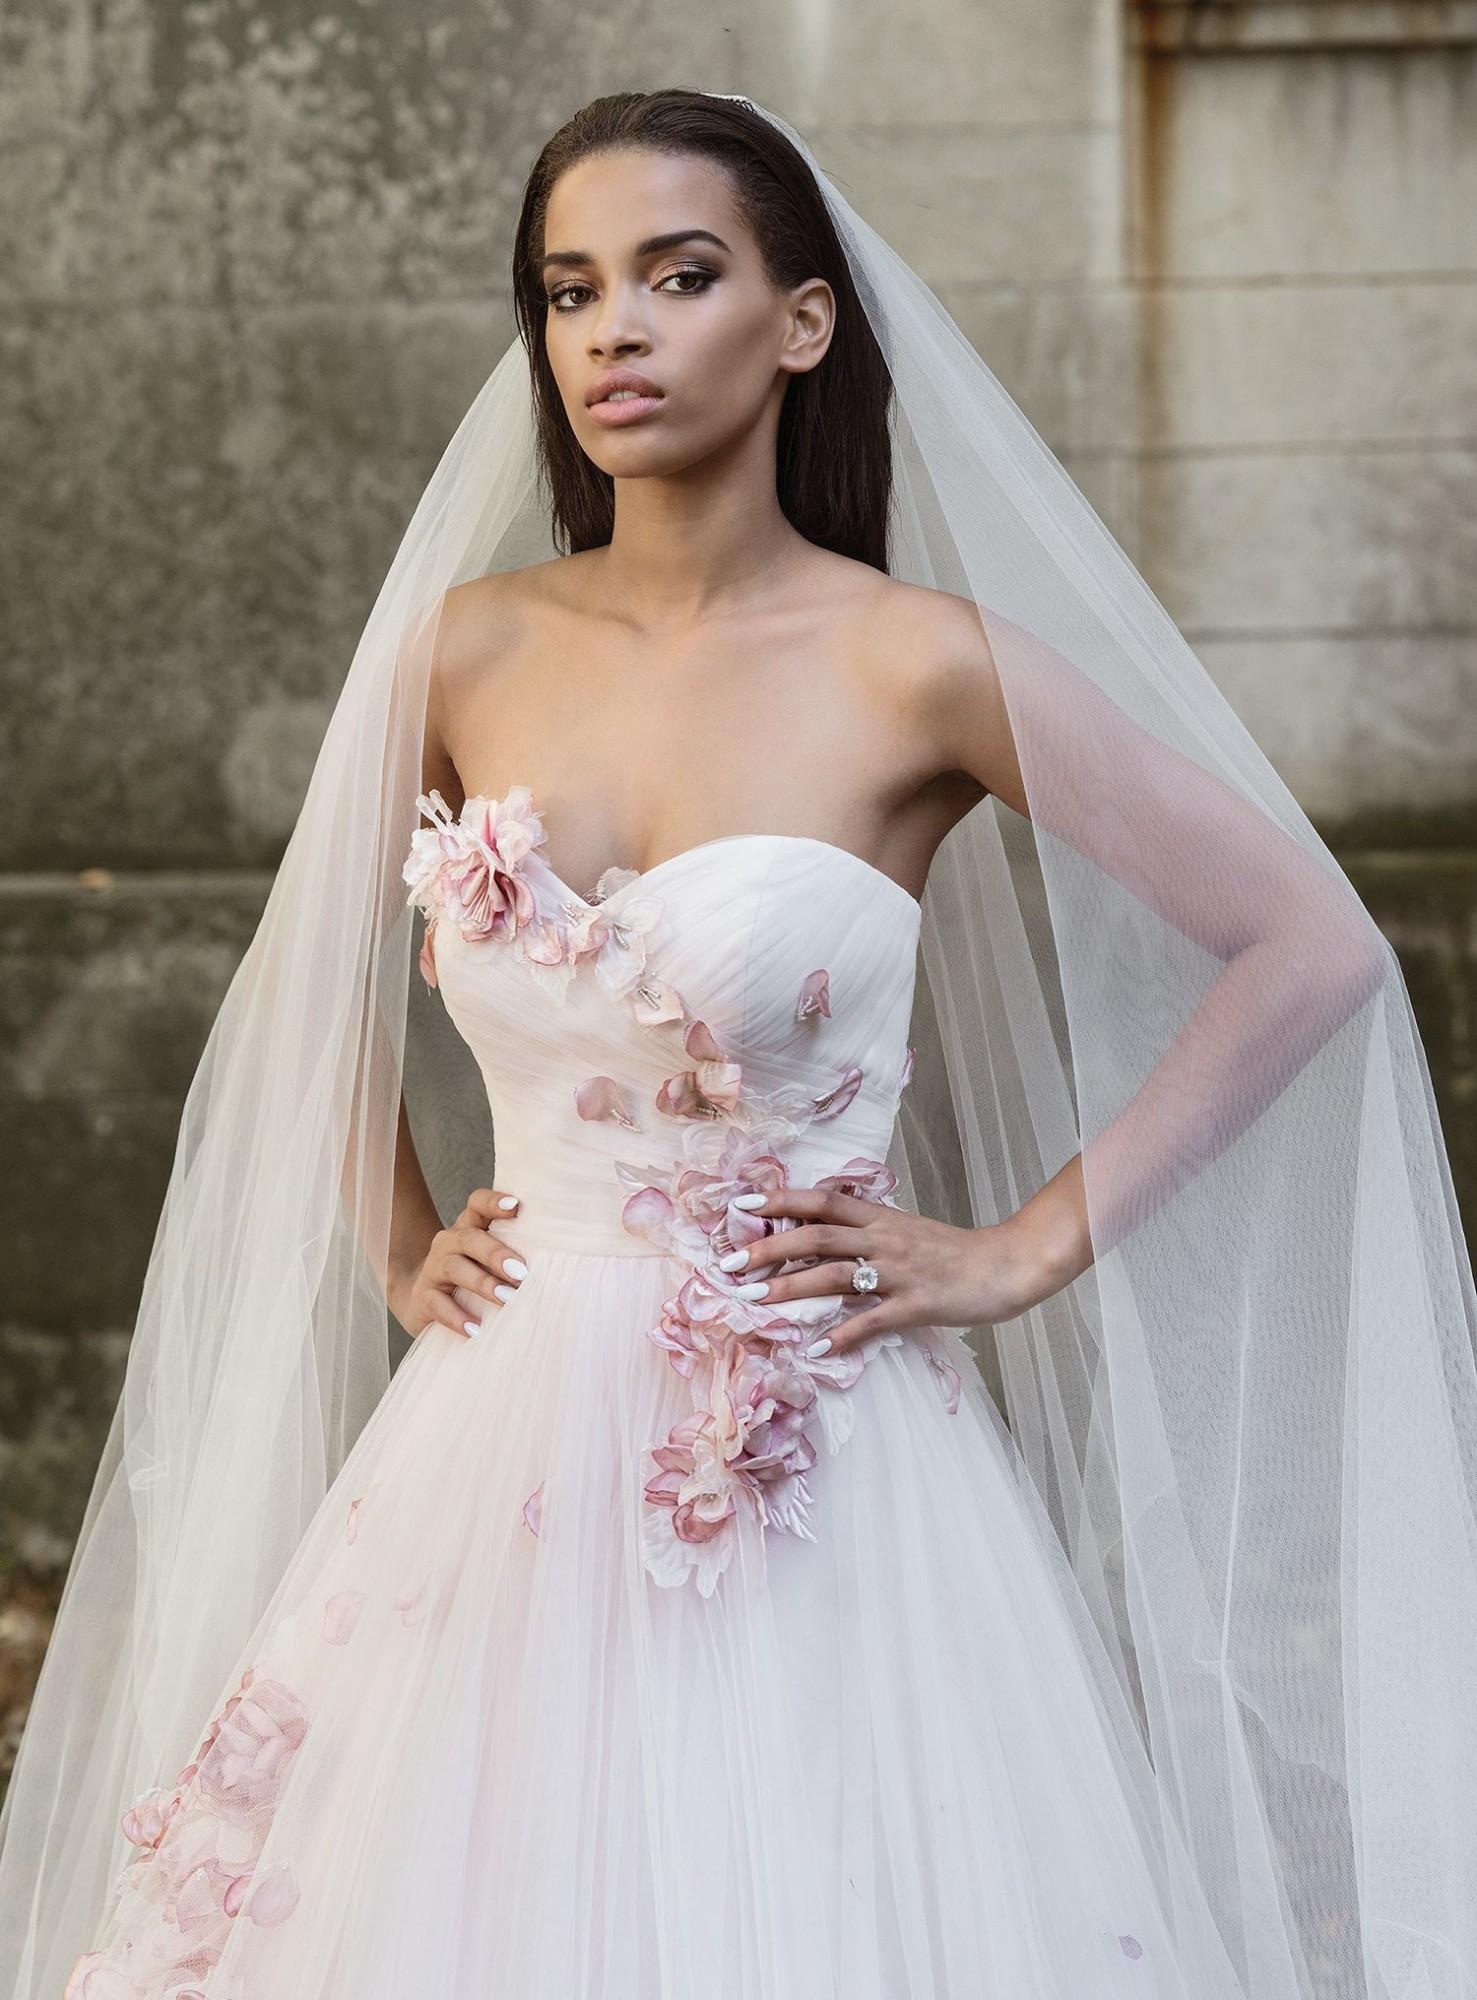 ROBE MARIAGE 9865 JUSTIN ALEXANDER TRAPEZE RUE RIGORD 13007 MARSEILLE soniab